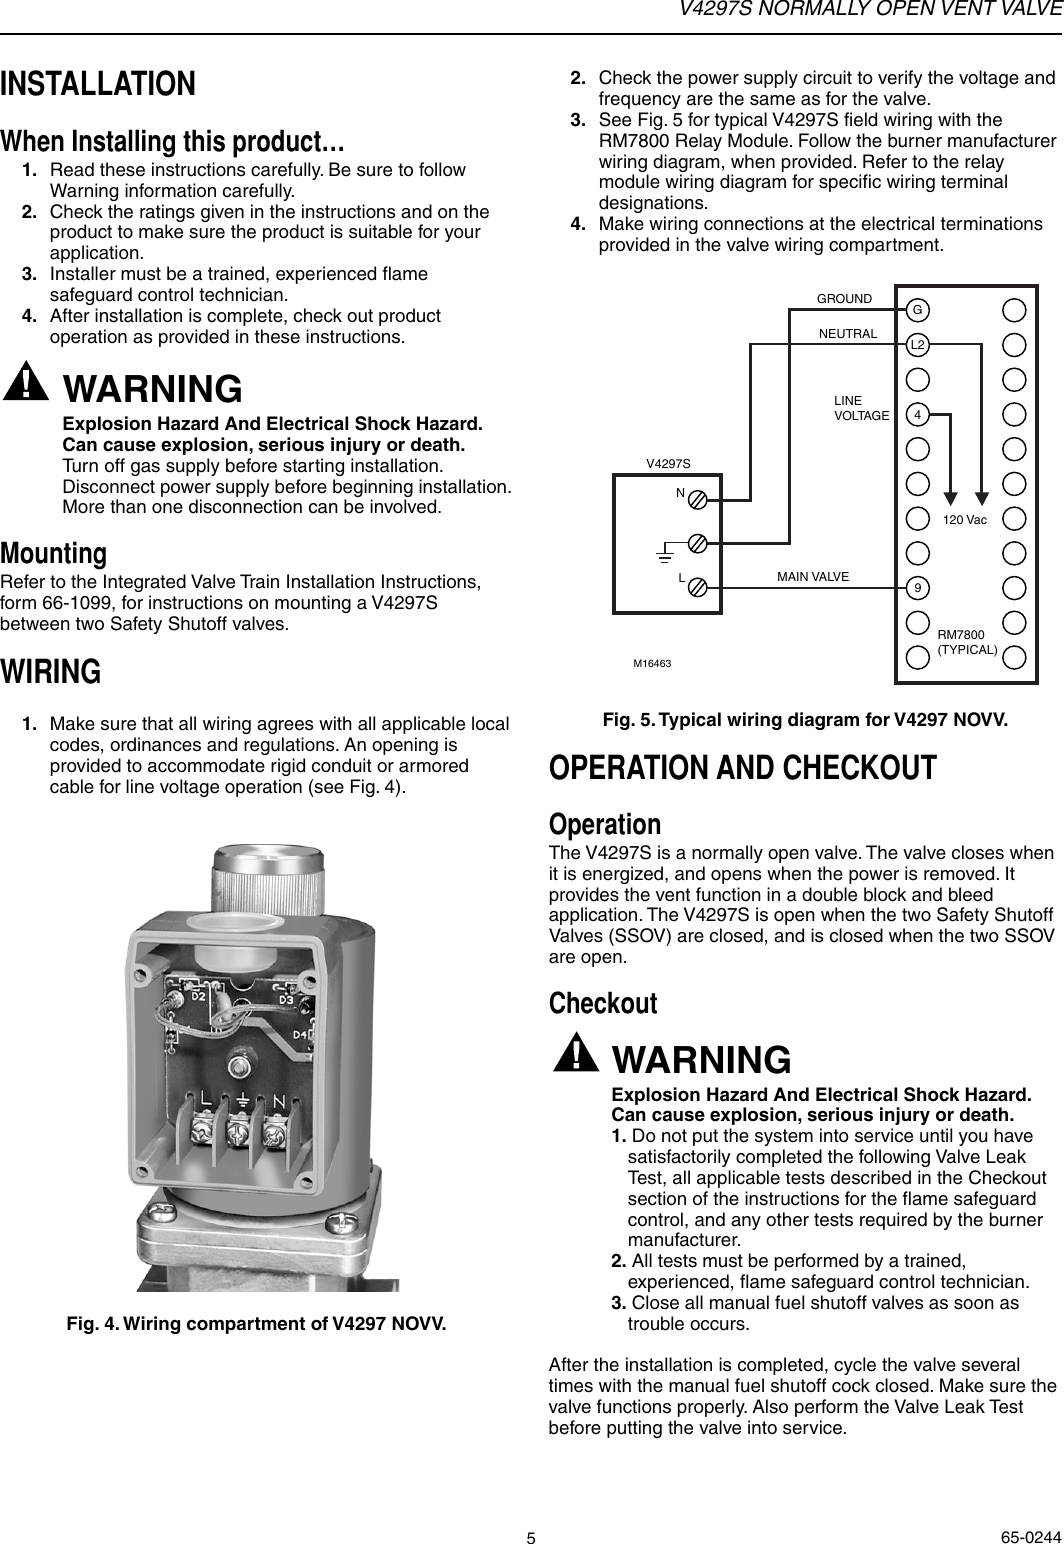 hight resolution of page 5 of 8 honeywell honeywell vent valve v4297s users